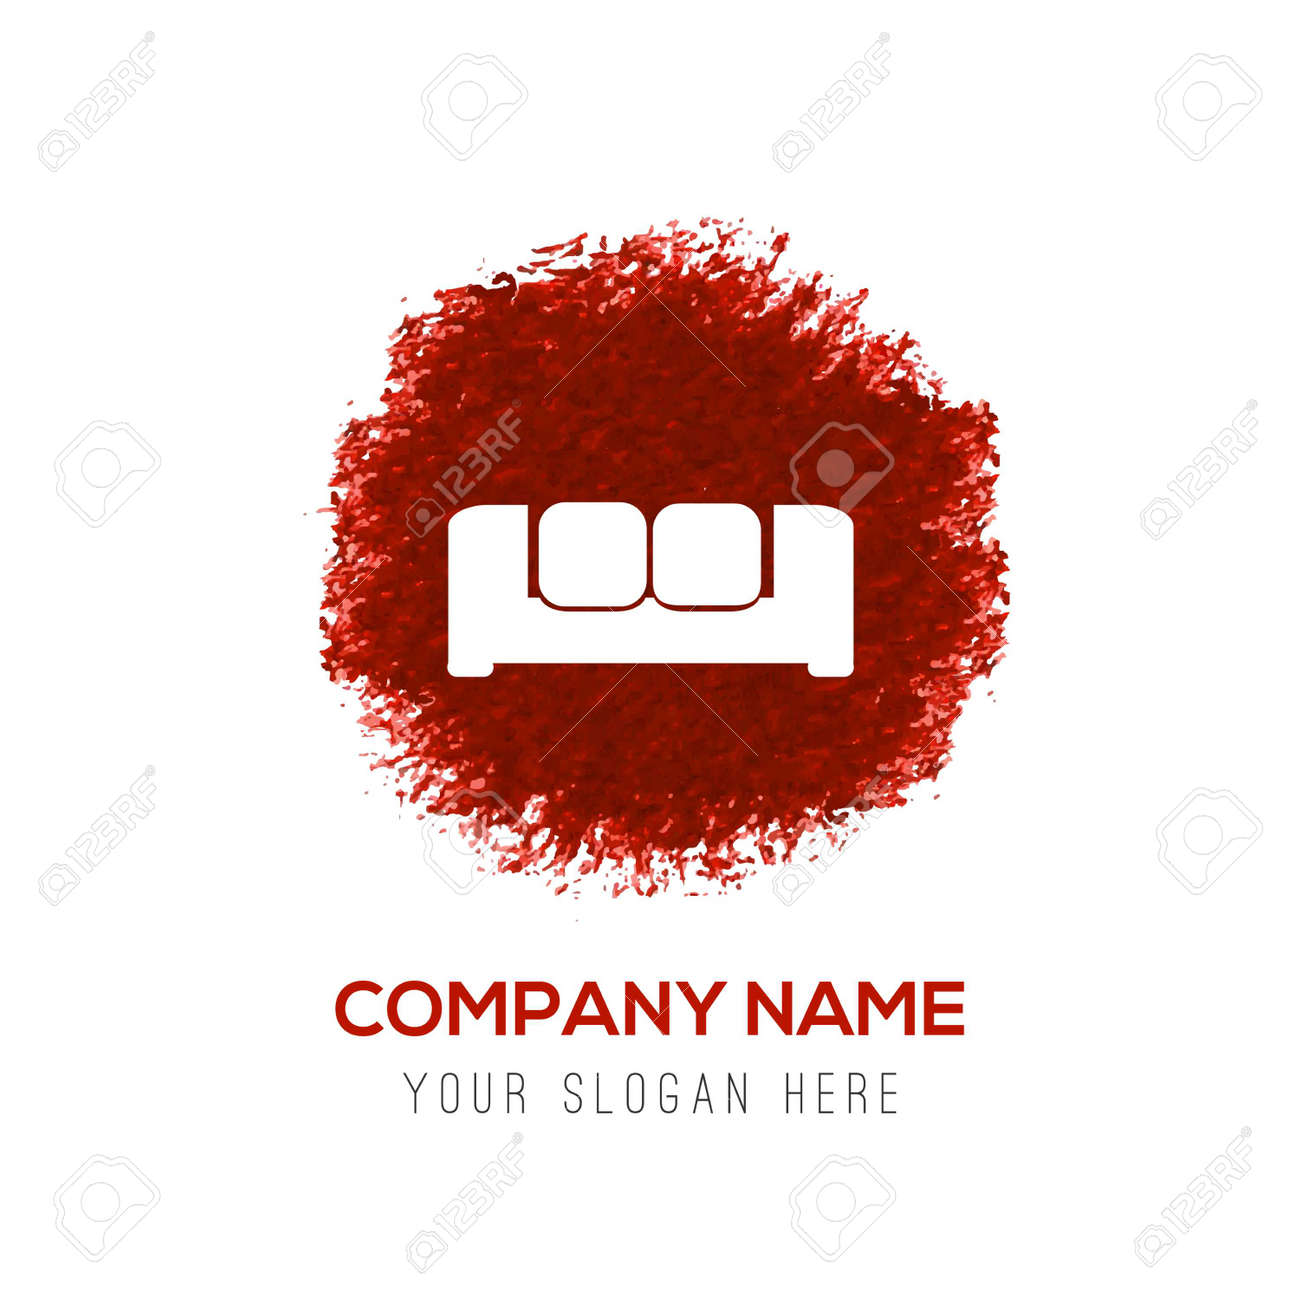 Sofa Icon - Red WaterColor Circle Splash - 122160361